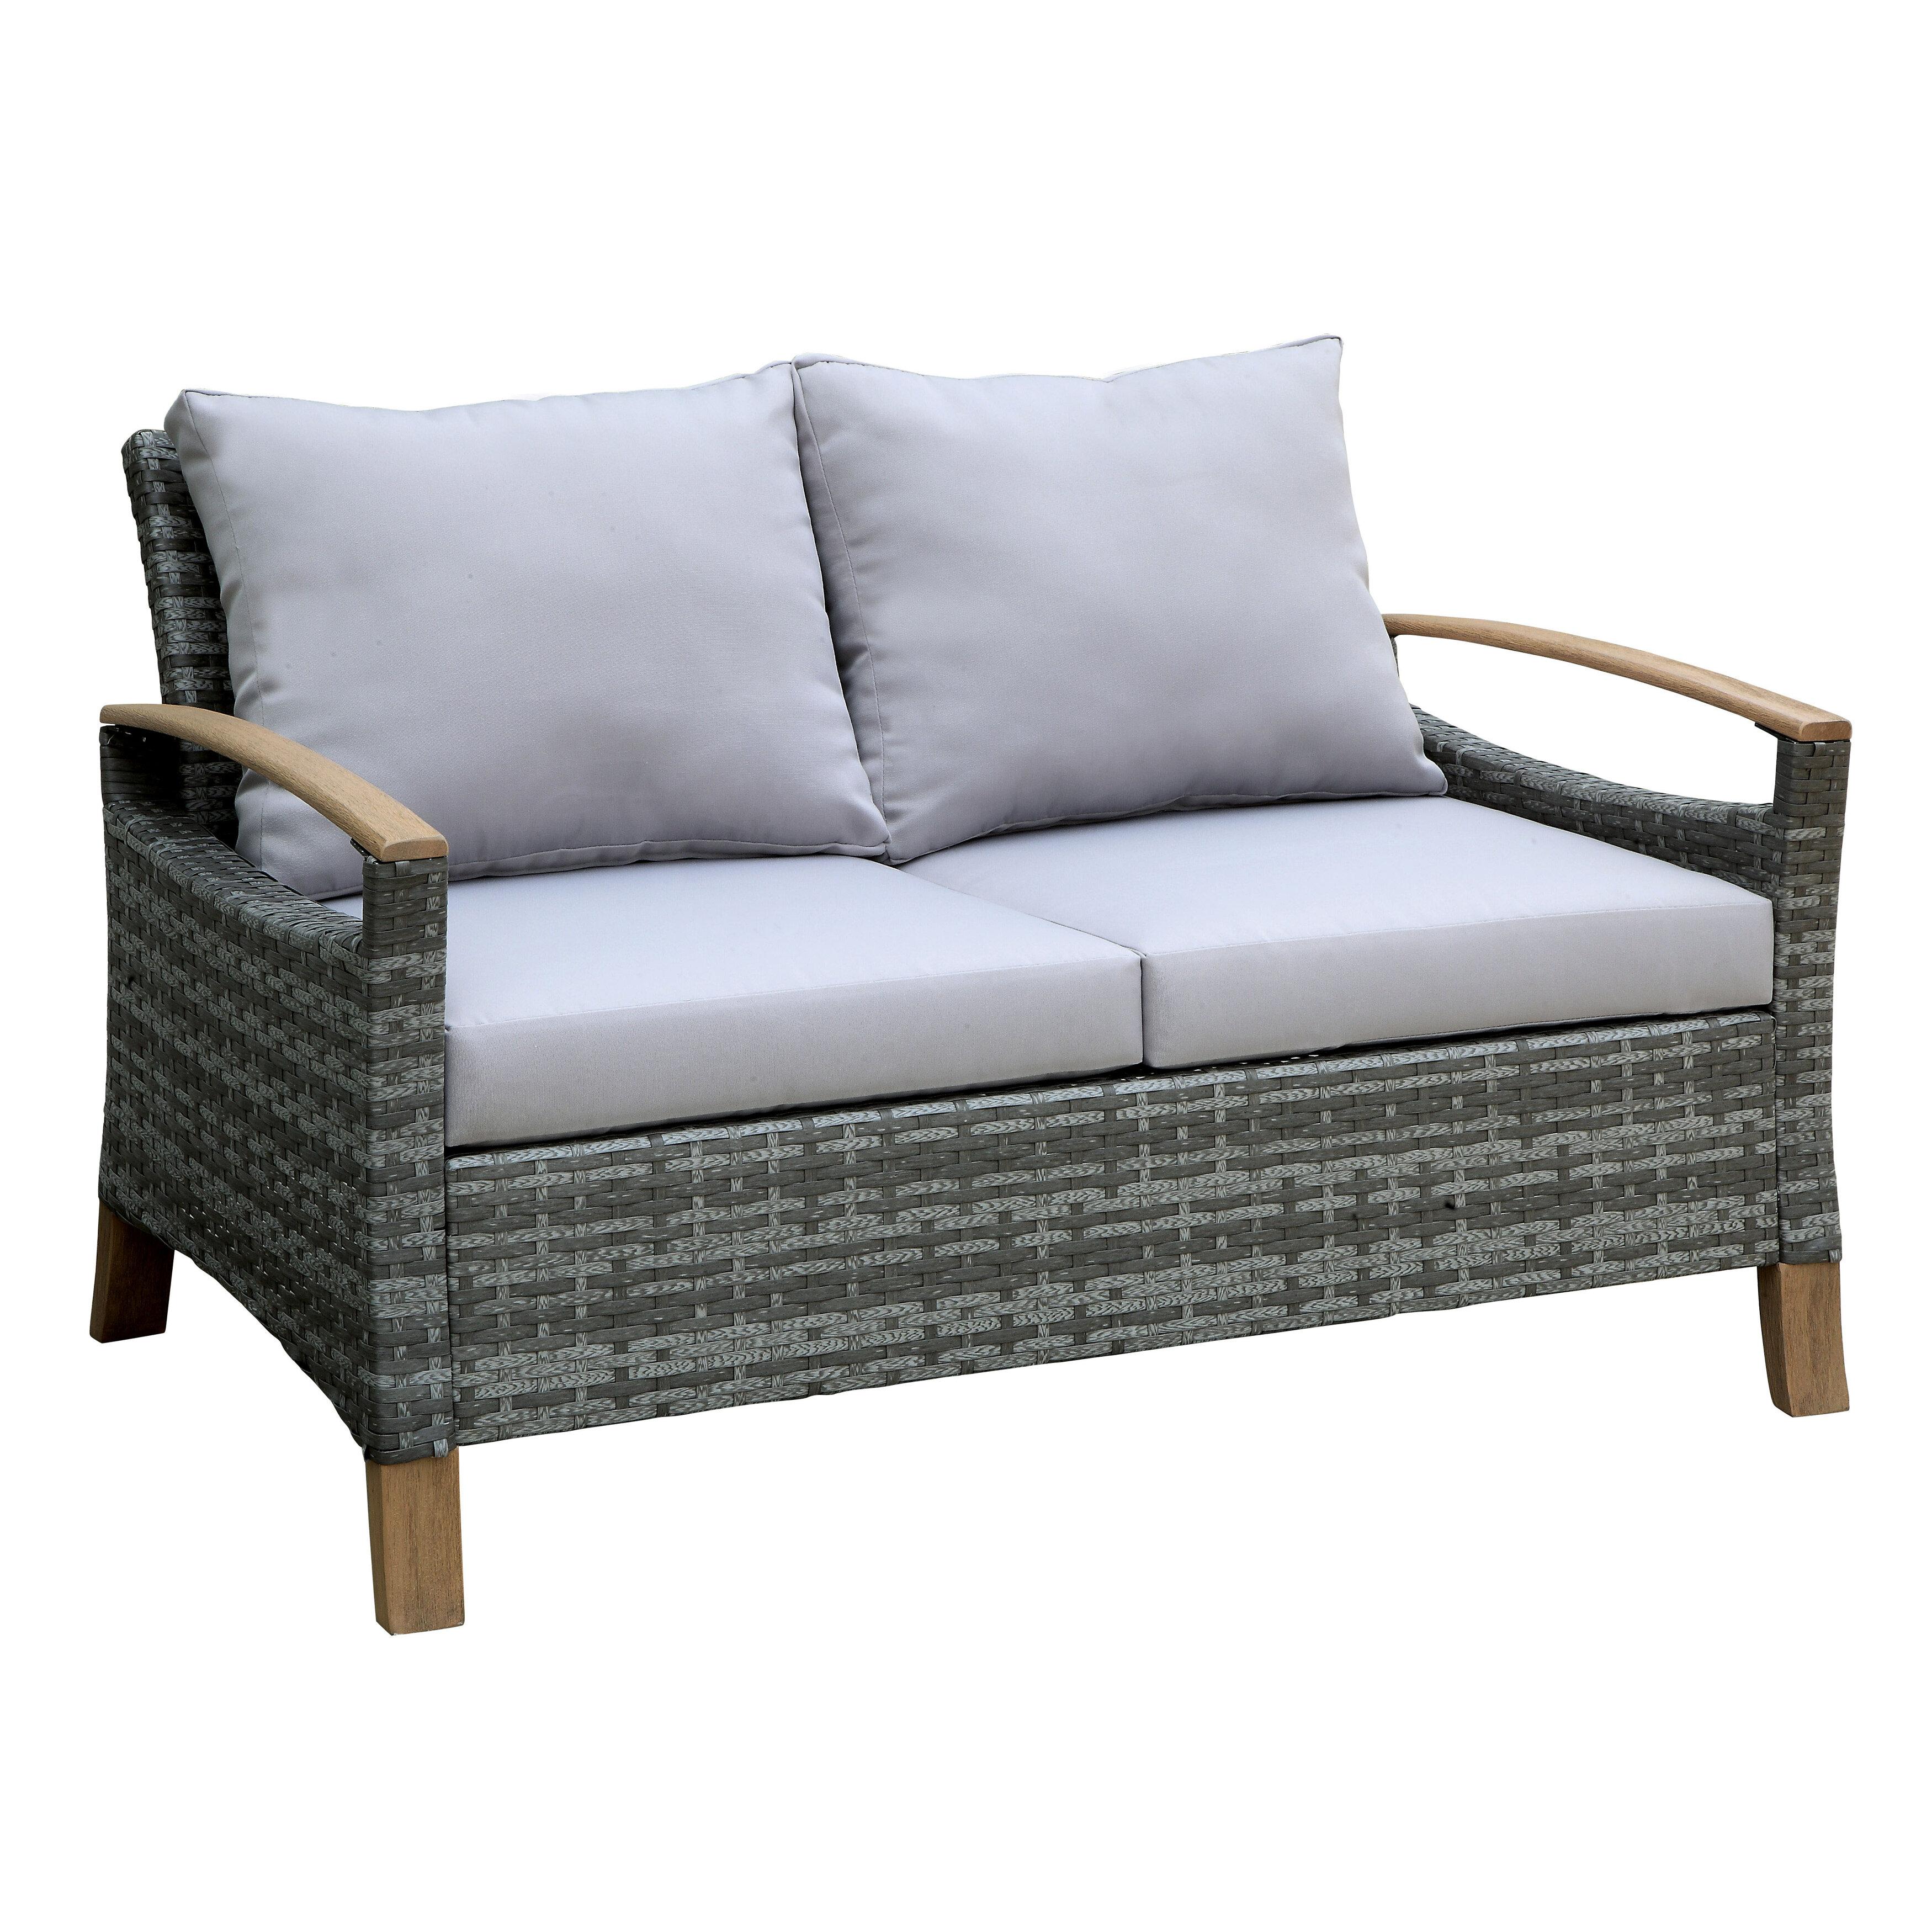 Pleasant Penniman Contemporary Loveseat With Cushions Frankydiablos Diy Chair Ideas Frankydiabloscom